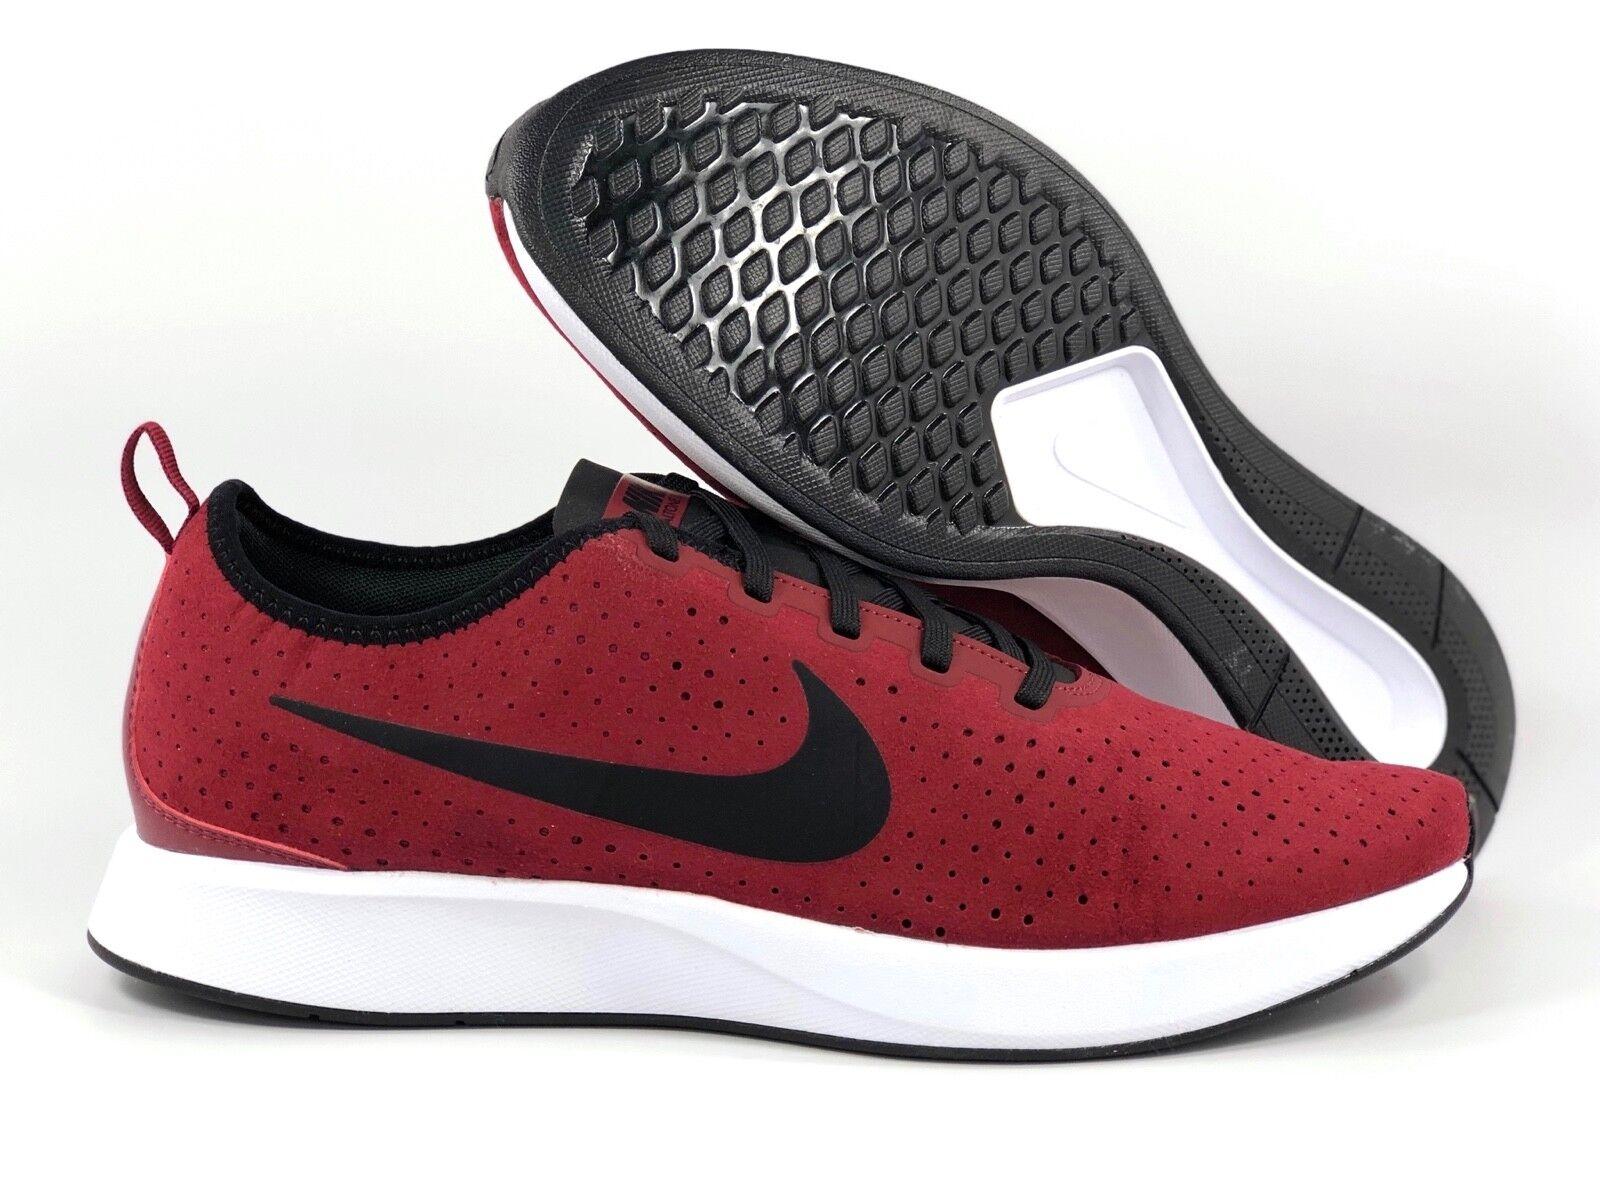 premium selection 8cd6c 62e22 Nike Dualtone Racer PRM Team Team Team Red Black White 924448-600 Men s 8.5-